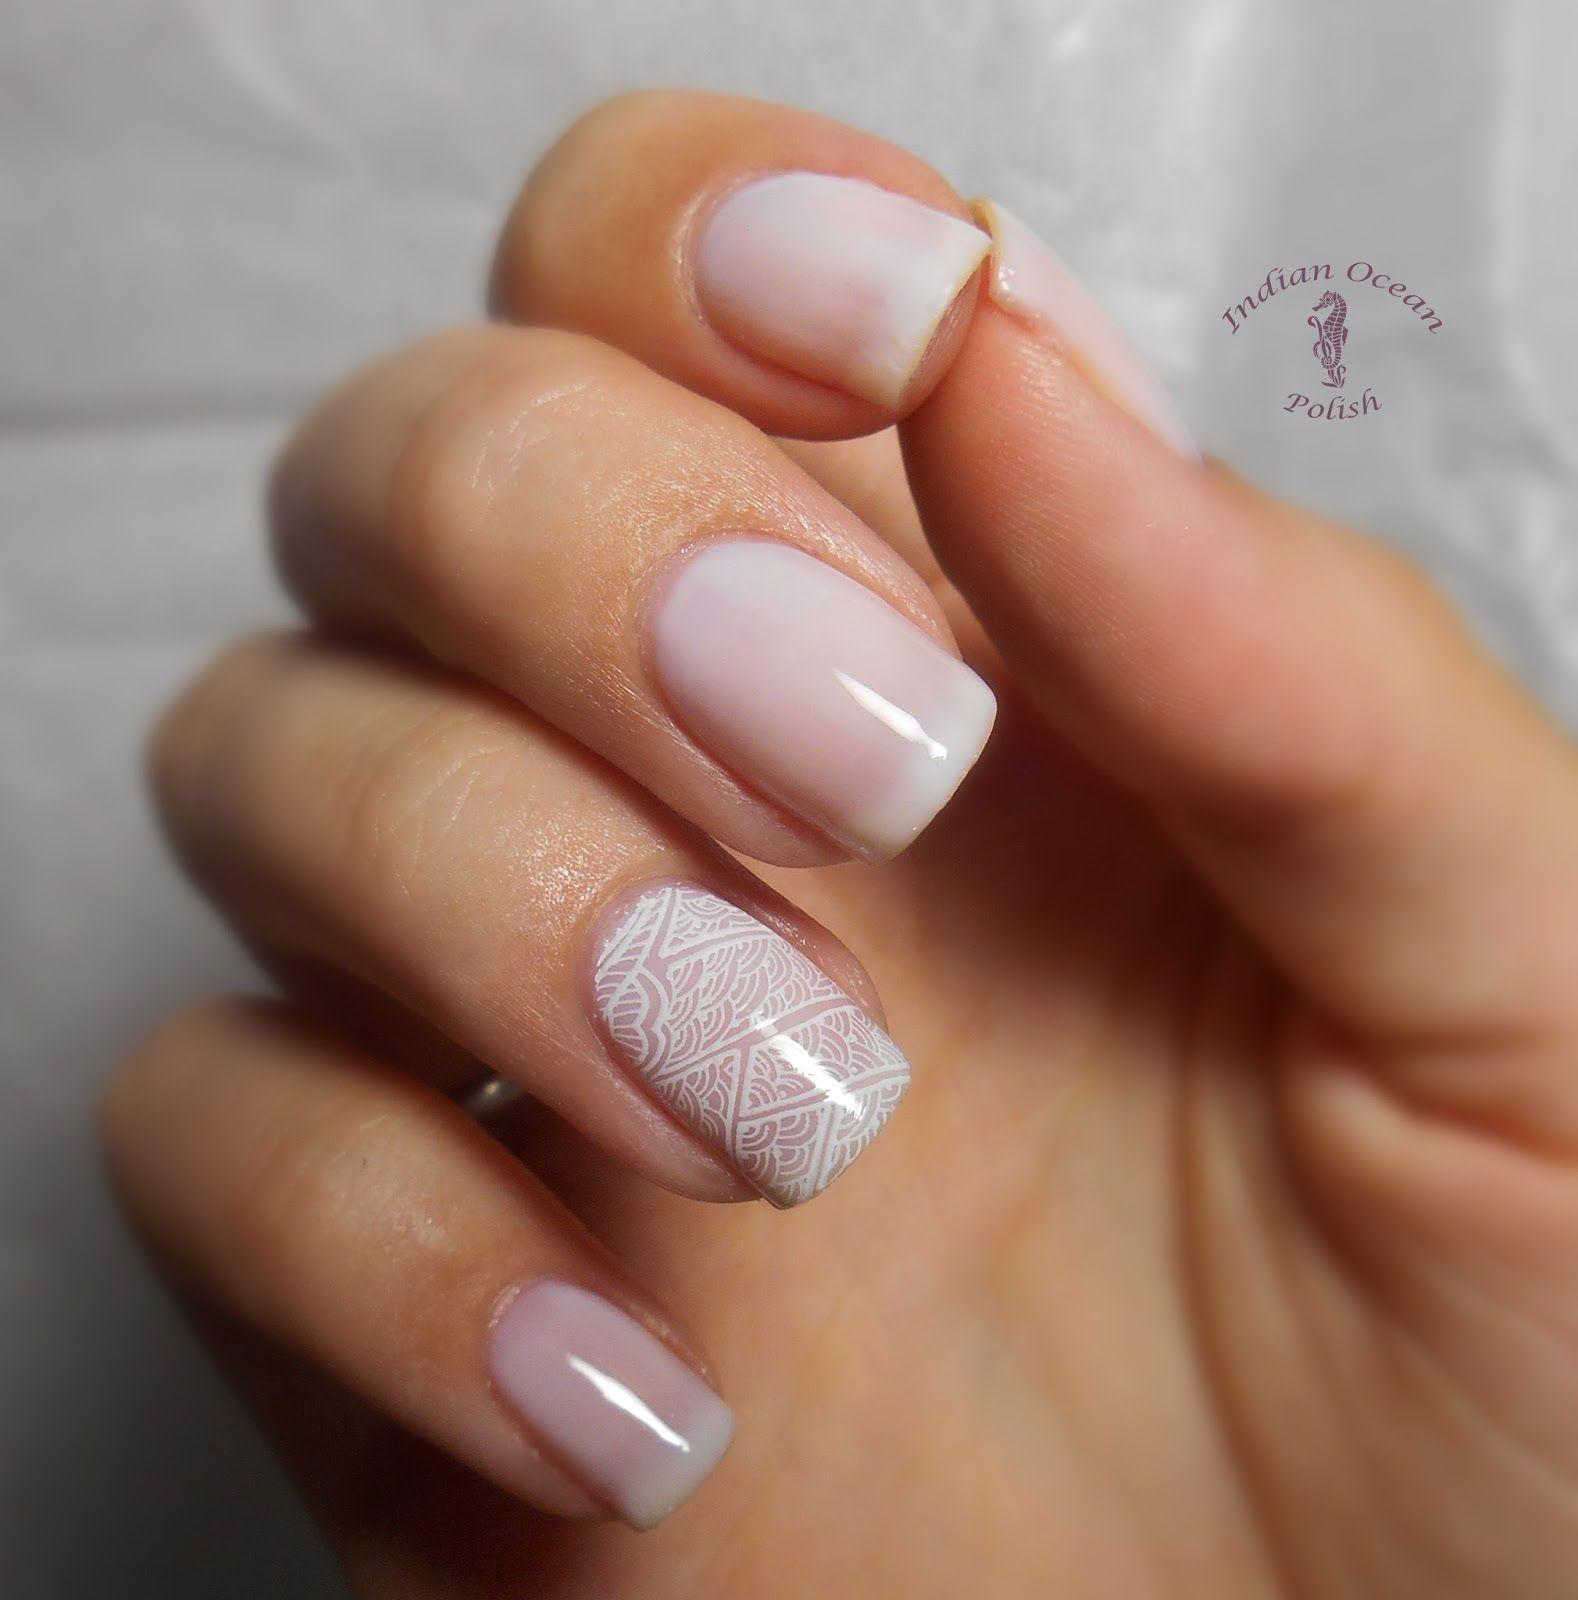 Wedding+manicure+nails+bridal+subtle+lace+stamping.jpg (1578×1600 ...